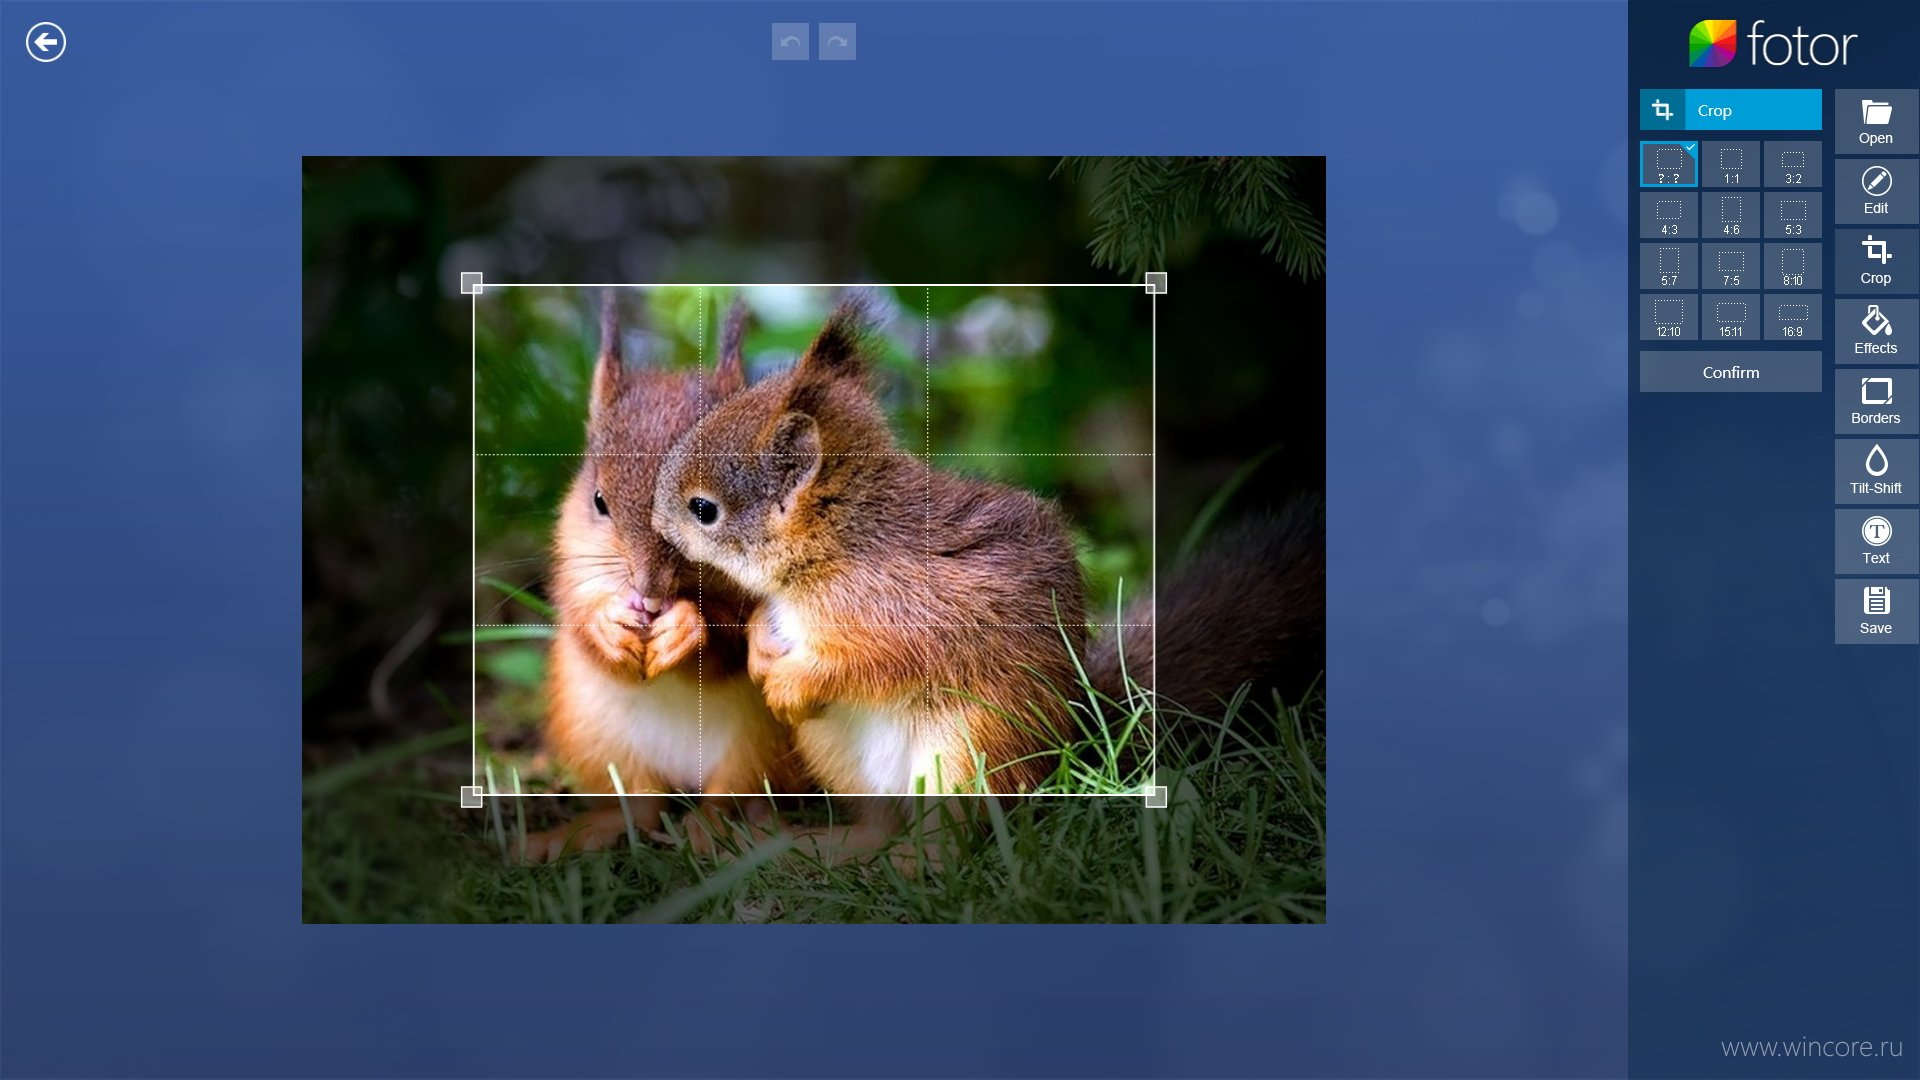 приложение для обработки фотографий ...: www.wincore.ru/programs/558-fotor-otlichnoe-prilozhenie-dlya...